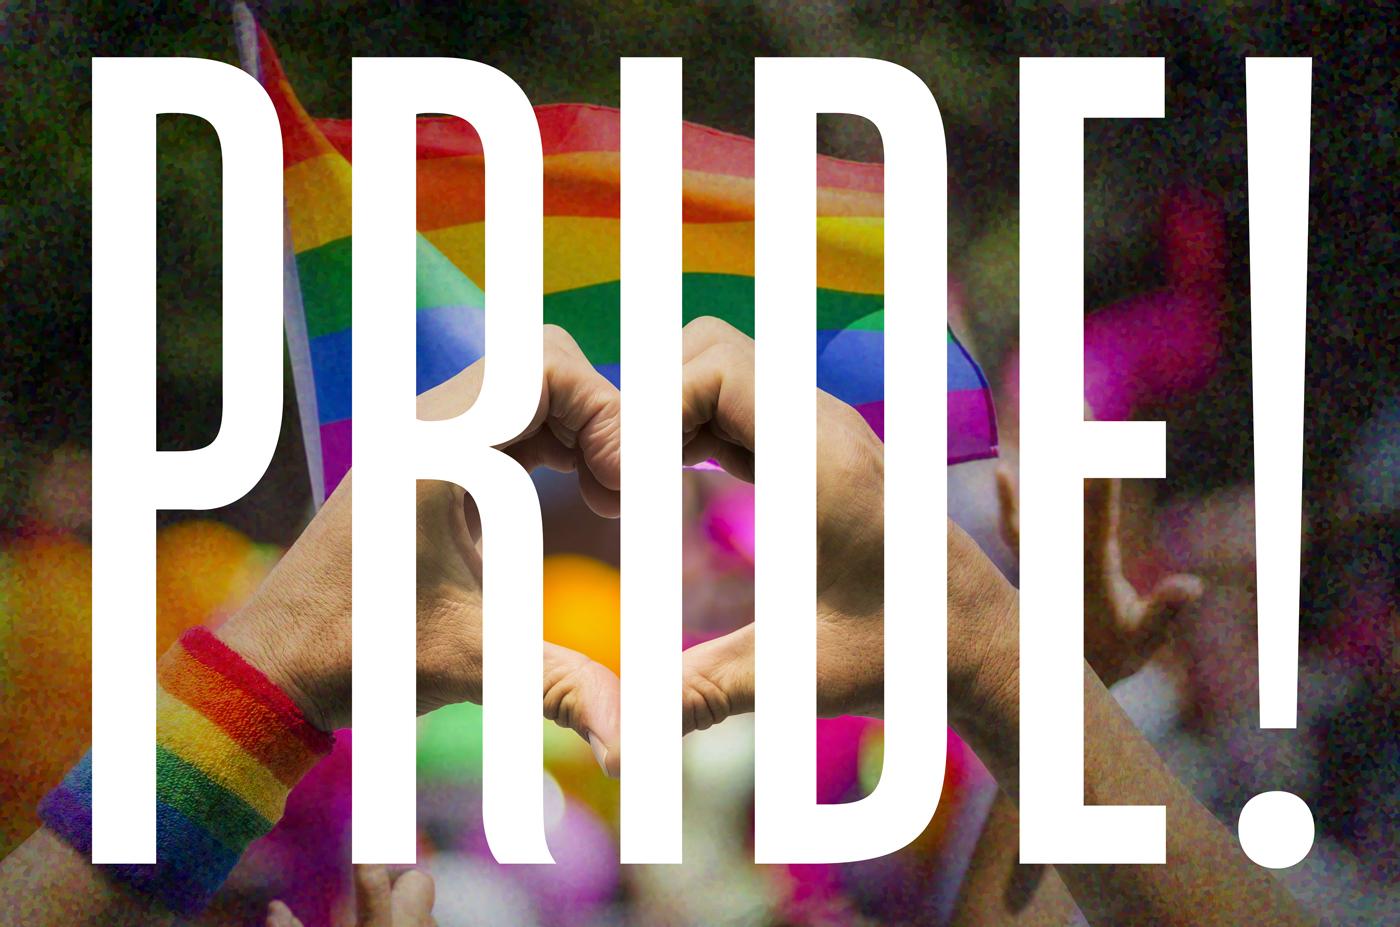 pride - forestburgh tavern cabaret